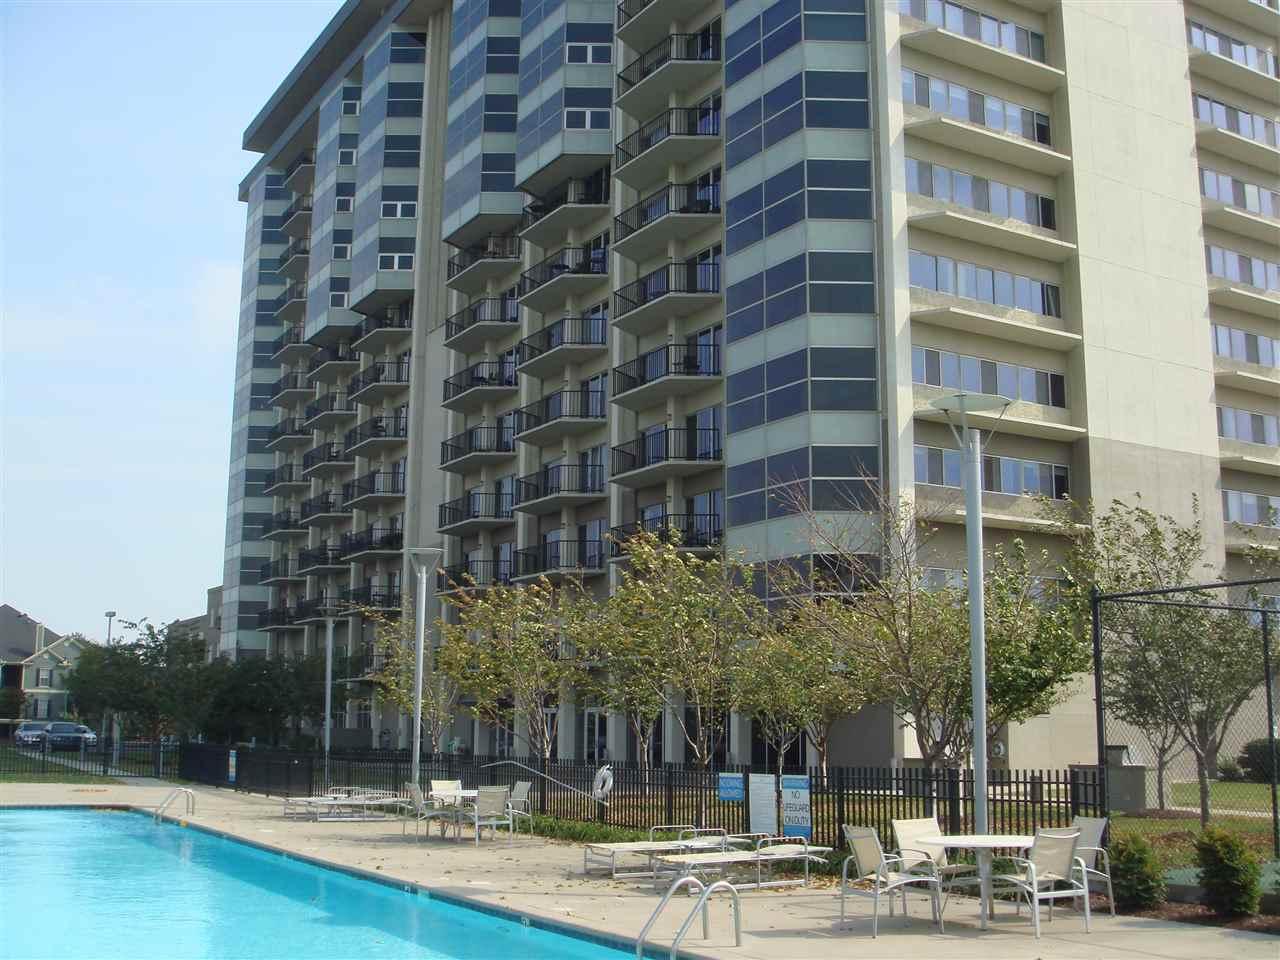 655 Riverside Dr #APT 401, Memphis, TN